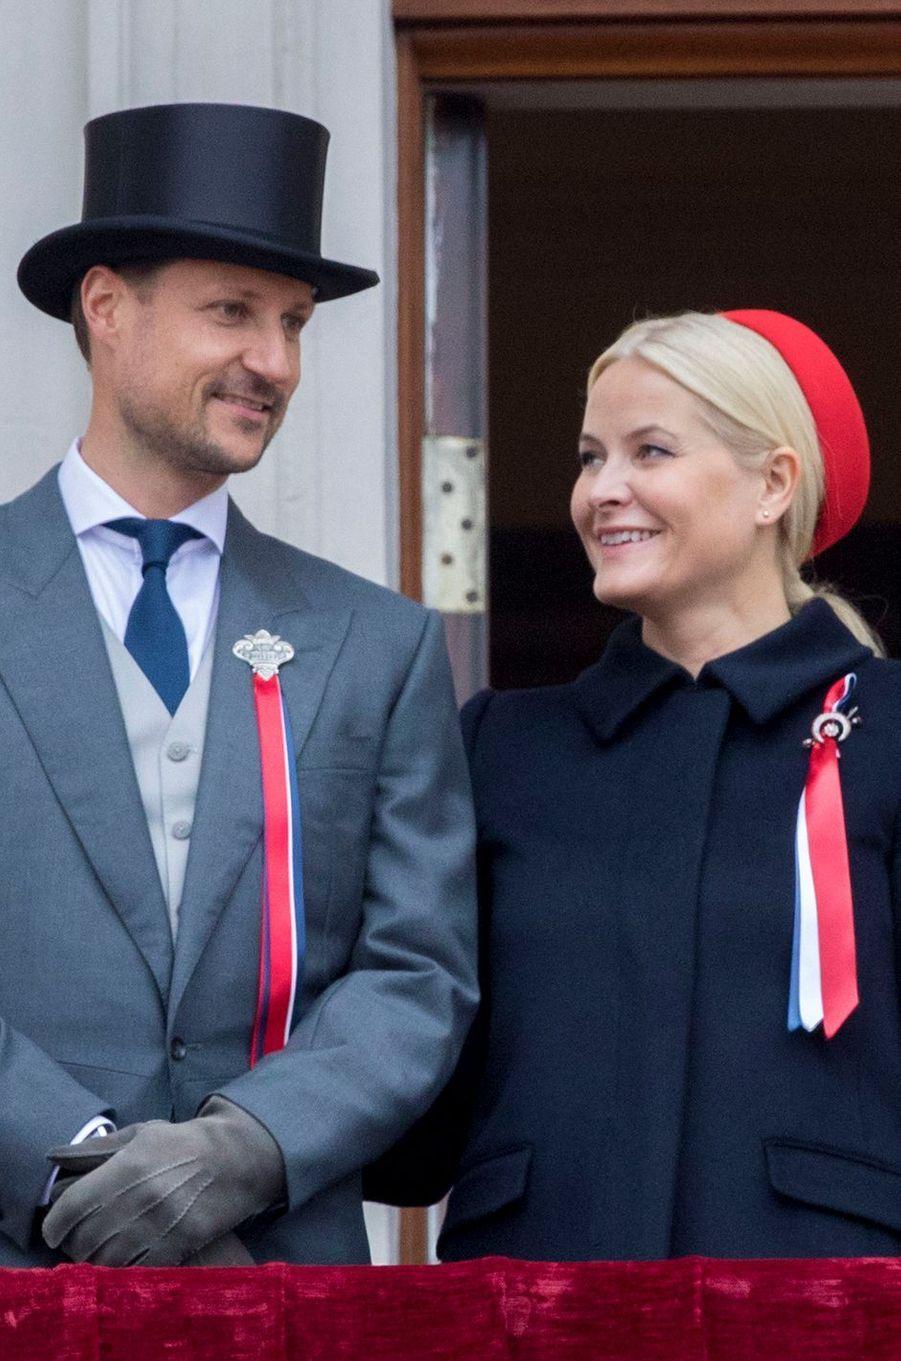 La princesse Mette-Marit et le prince Haakon de Norvège à Oslo, le 17 mai 2017